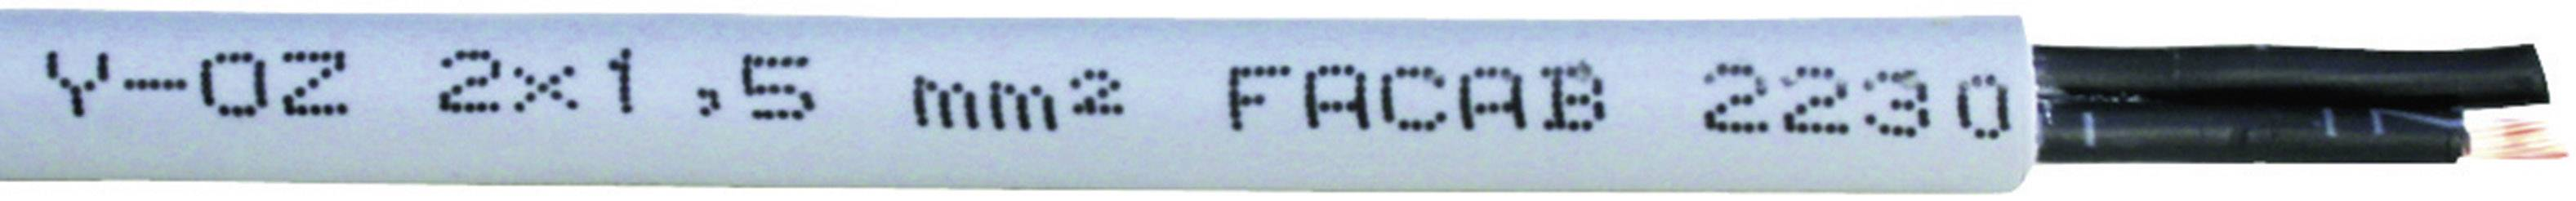 Riadiaci kábel Faber Kabel YSLY-OZ 030870, 5 x 0.50 mm², vonkajší Ø 6.20 mm, 500 V, metrový tovar, sivá